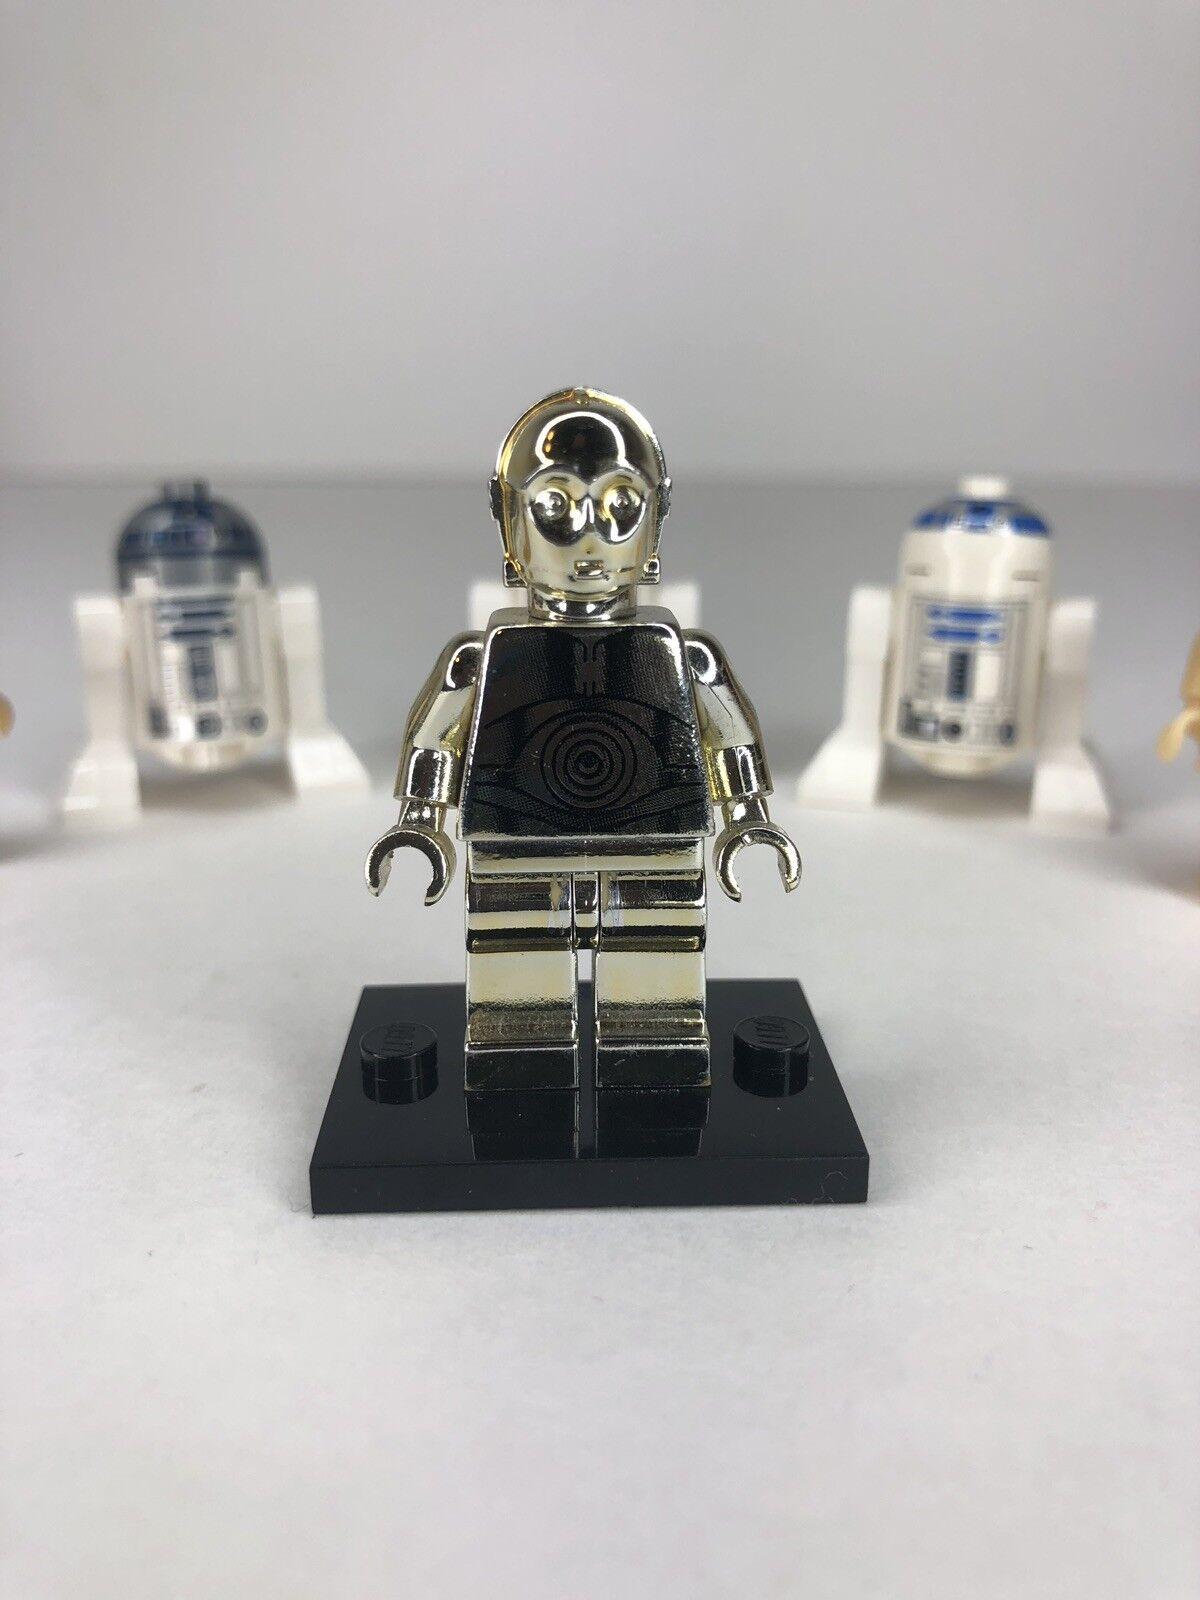 LEGO STAR WARS WARS WARS CHROME gold C-3PO 1 OF 10000 LIMITED EDITION C3PO R2D2 Sw158 Nn d137a1